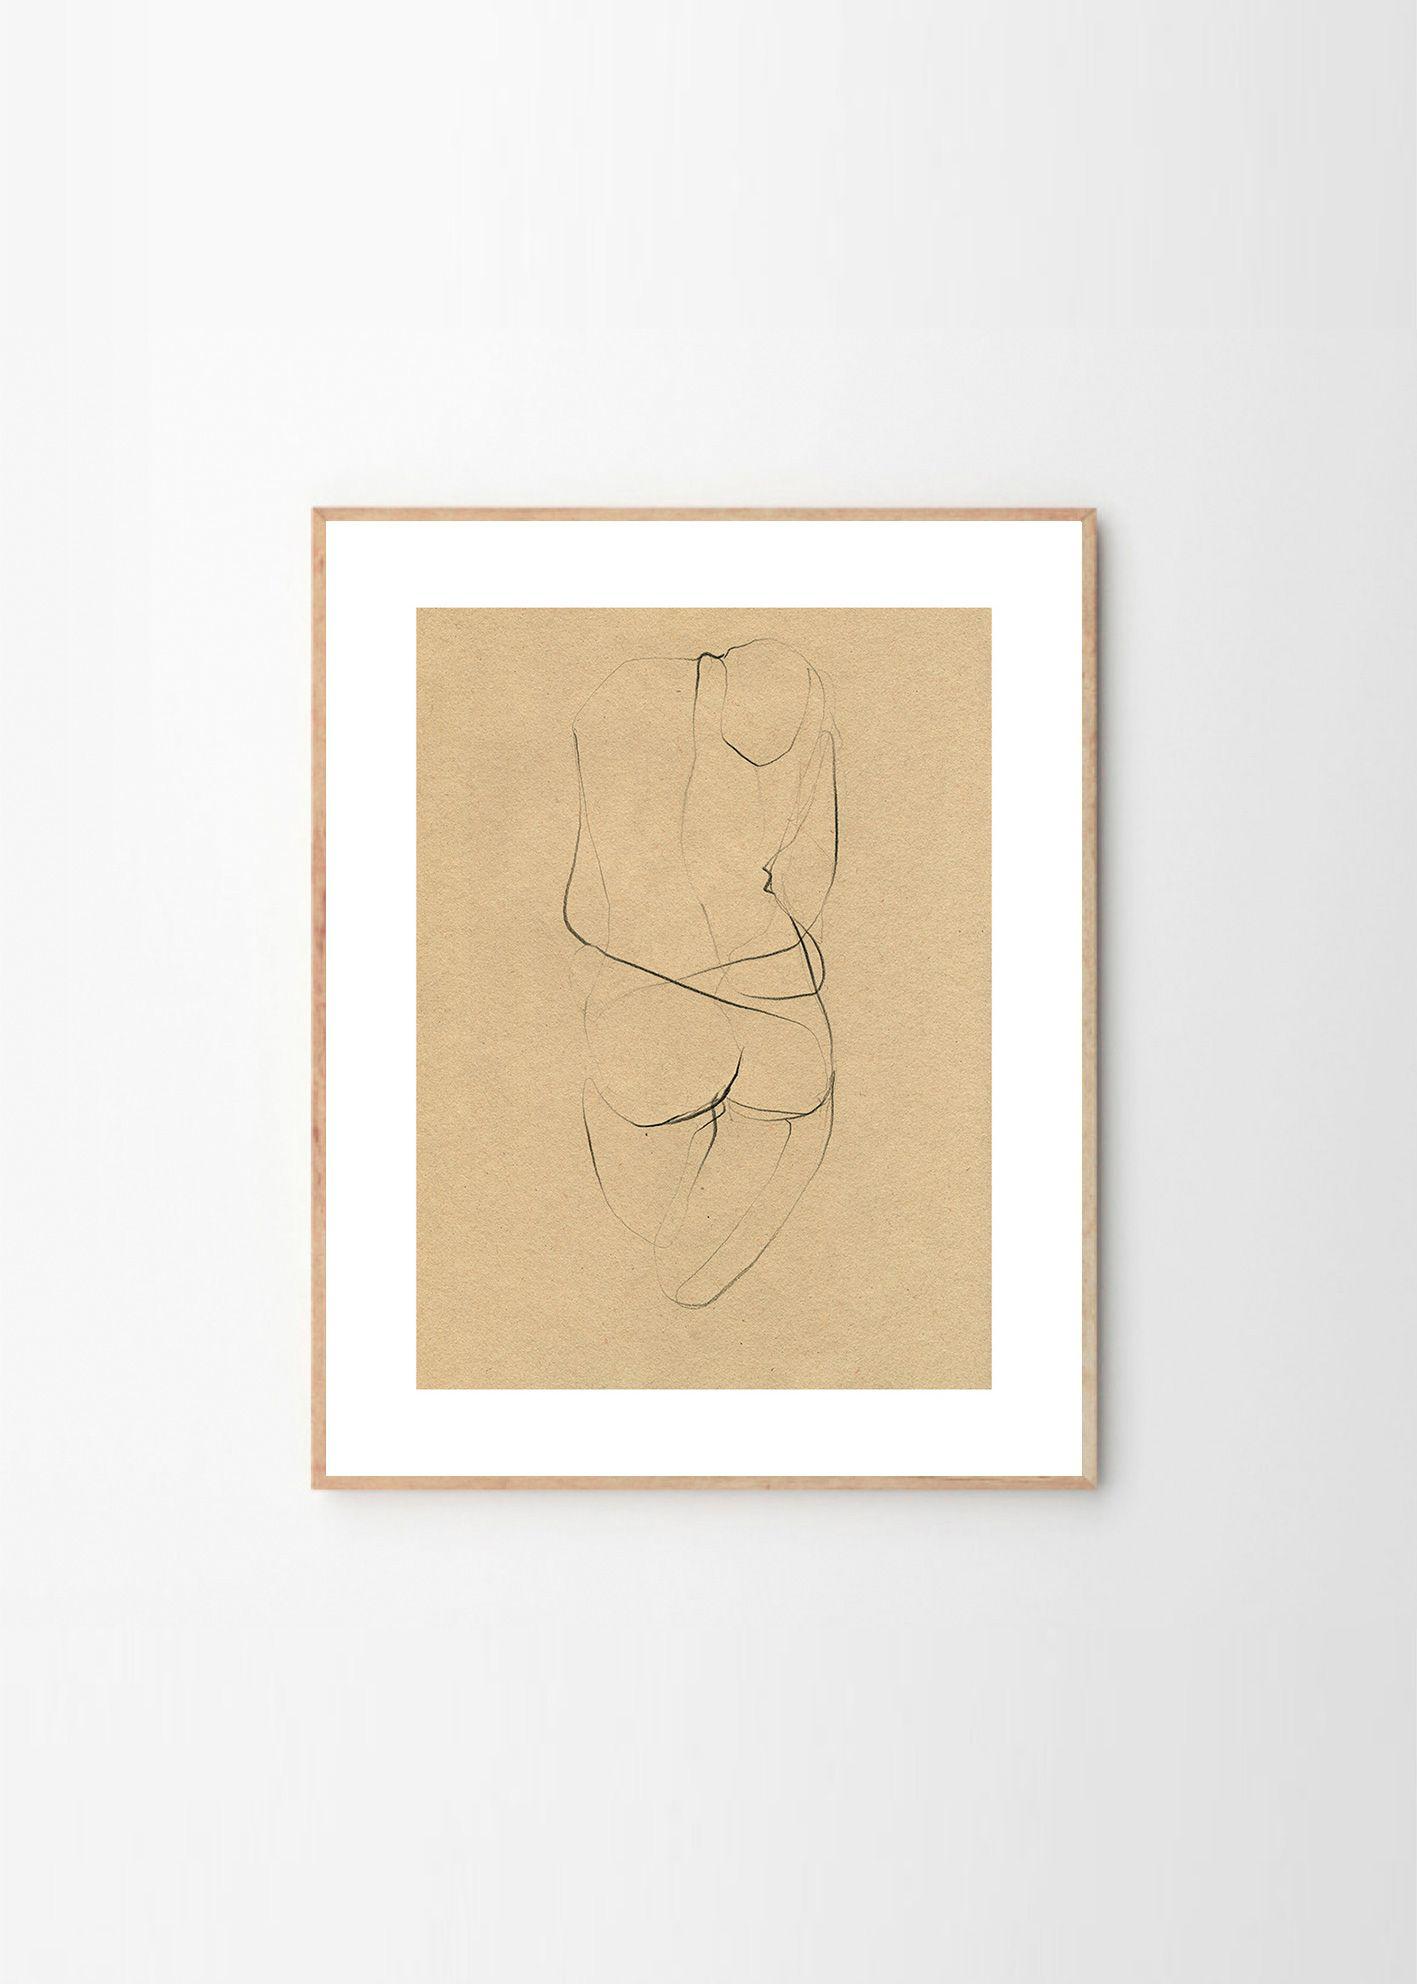 Ekaterina Koroleva - Nude 02   Artwork   Pinterest   Art prints ...